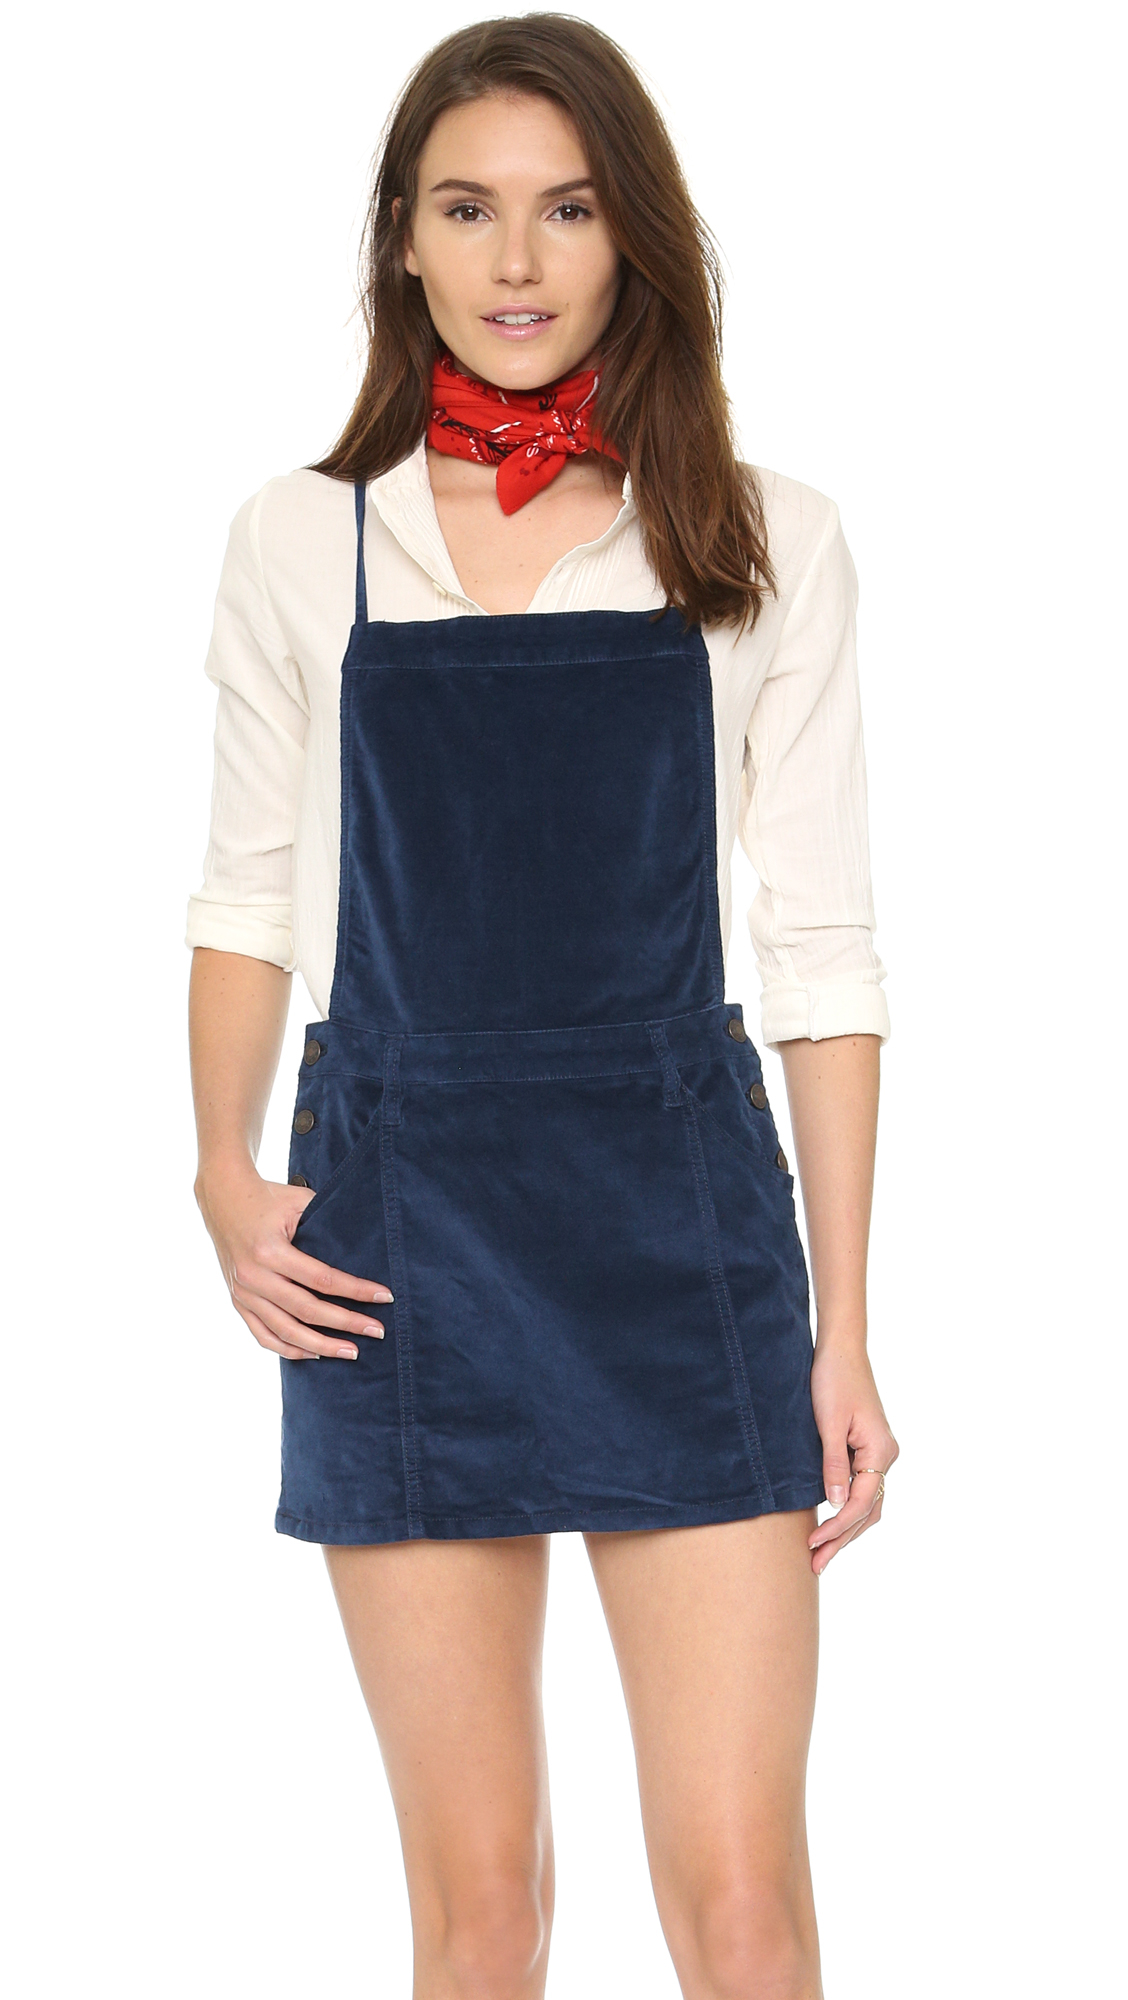 Blue apron dress - Gallery